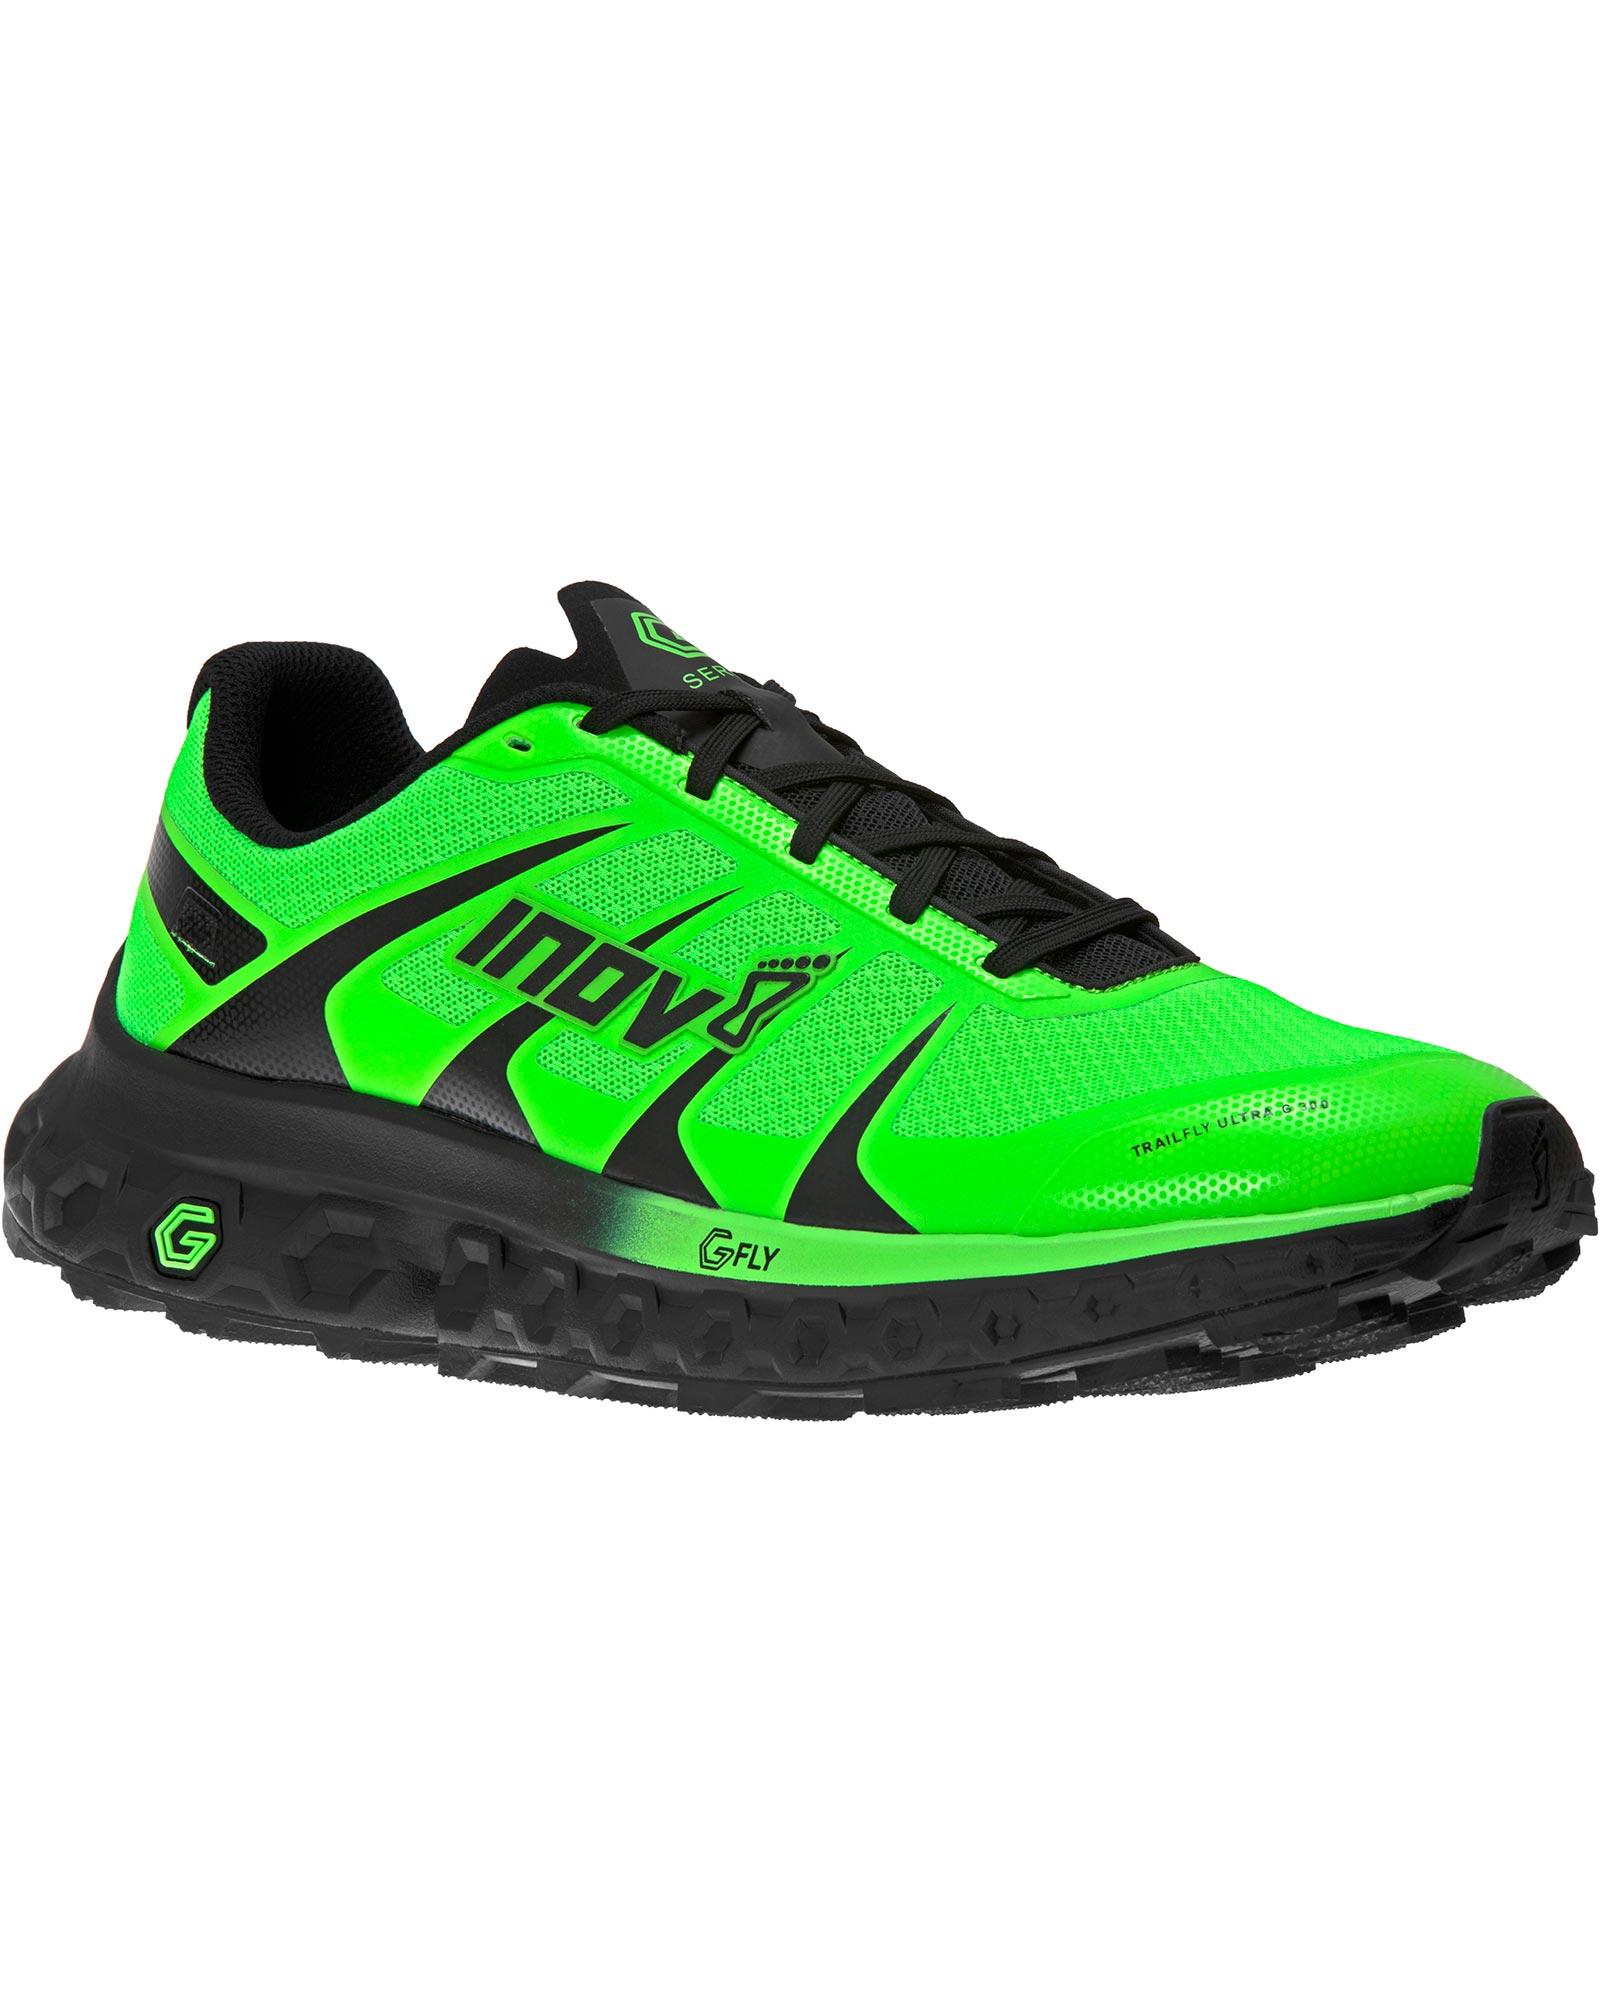 Inov-8 TrailFly Ultra G 300 Max Women's Shoes